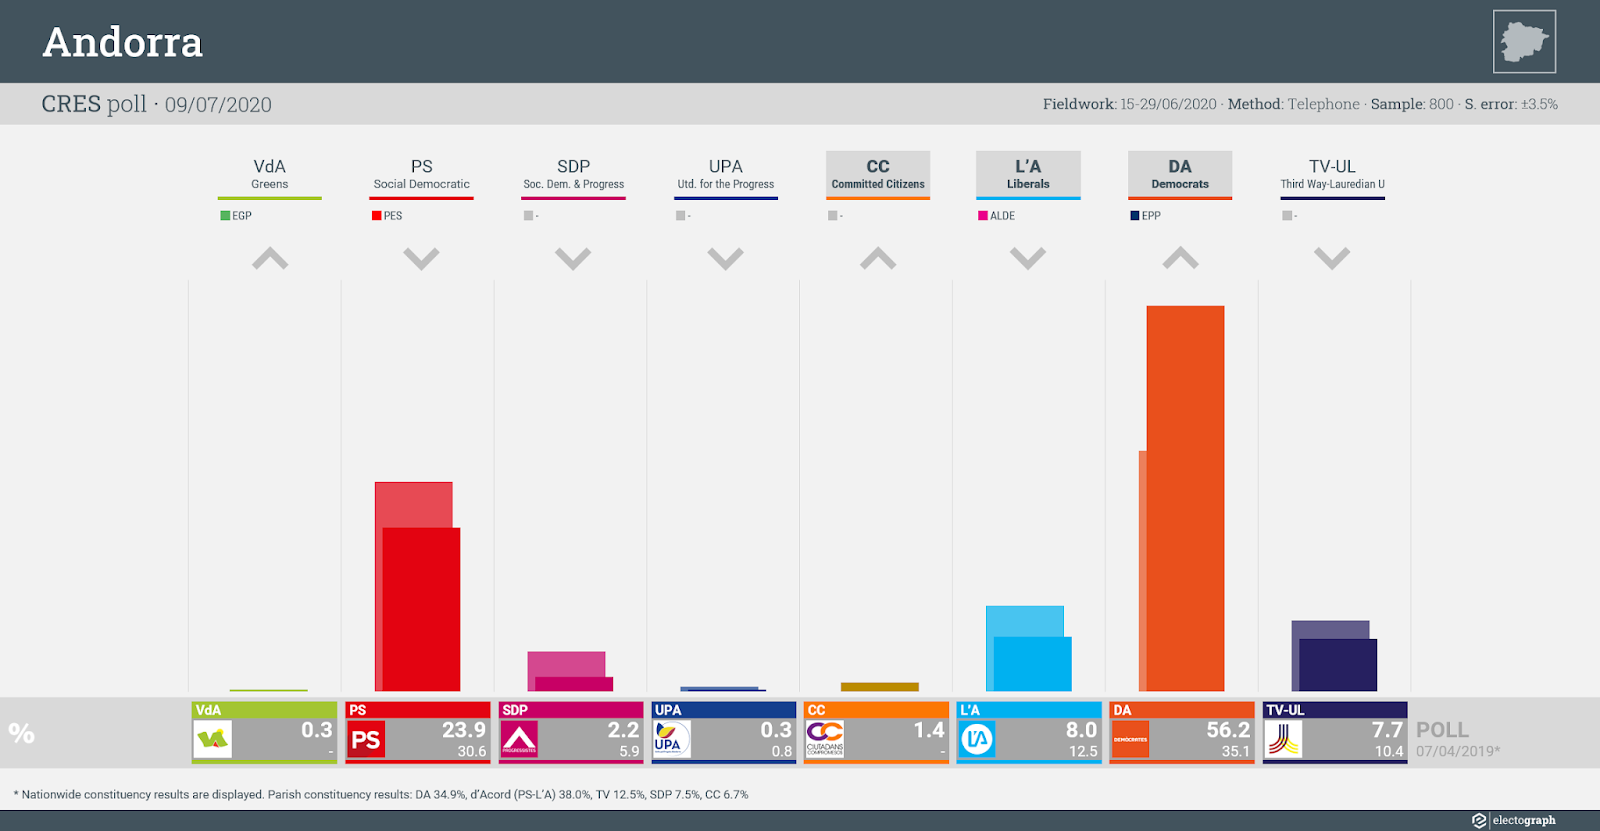 ANDORRA: CRES poll chart, 9 July 2020